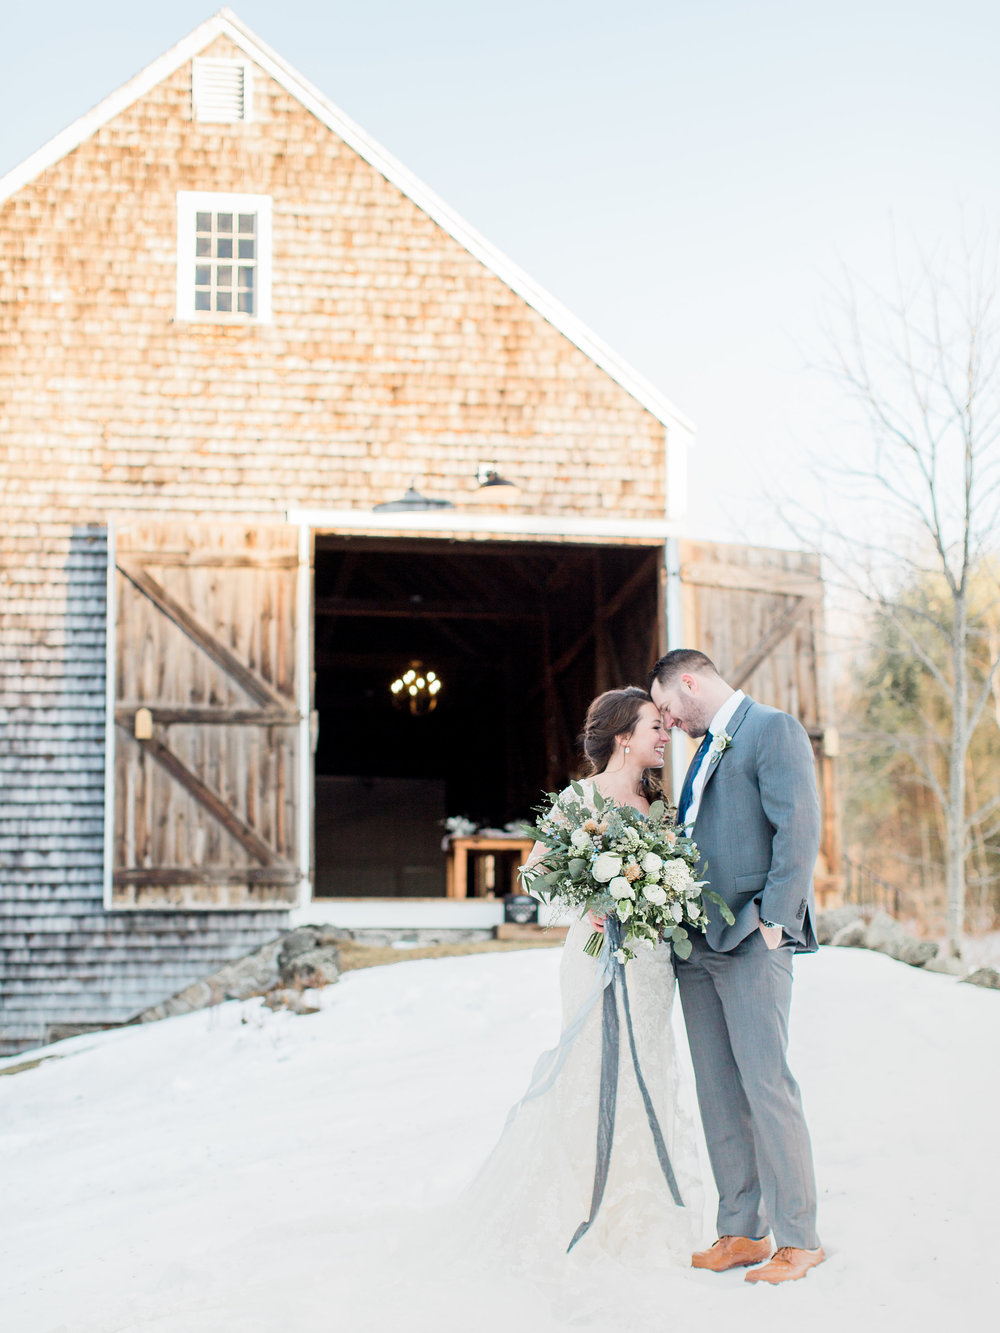 Cunningham_Farm_Winter_Styled_Wedding_Shoot_Meredith_Jane_Photography-207.jpg